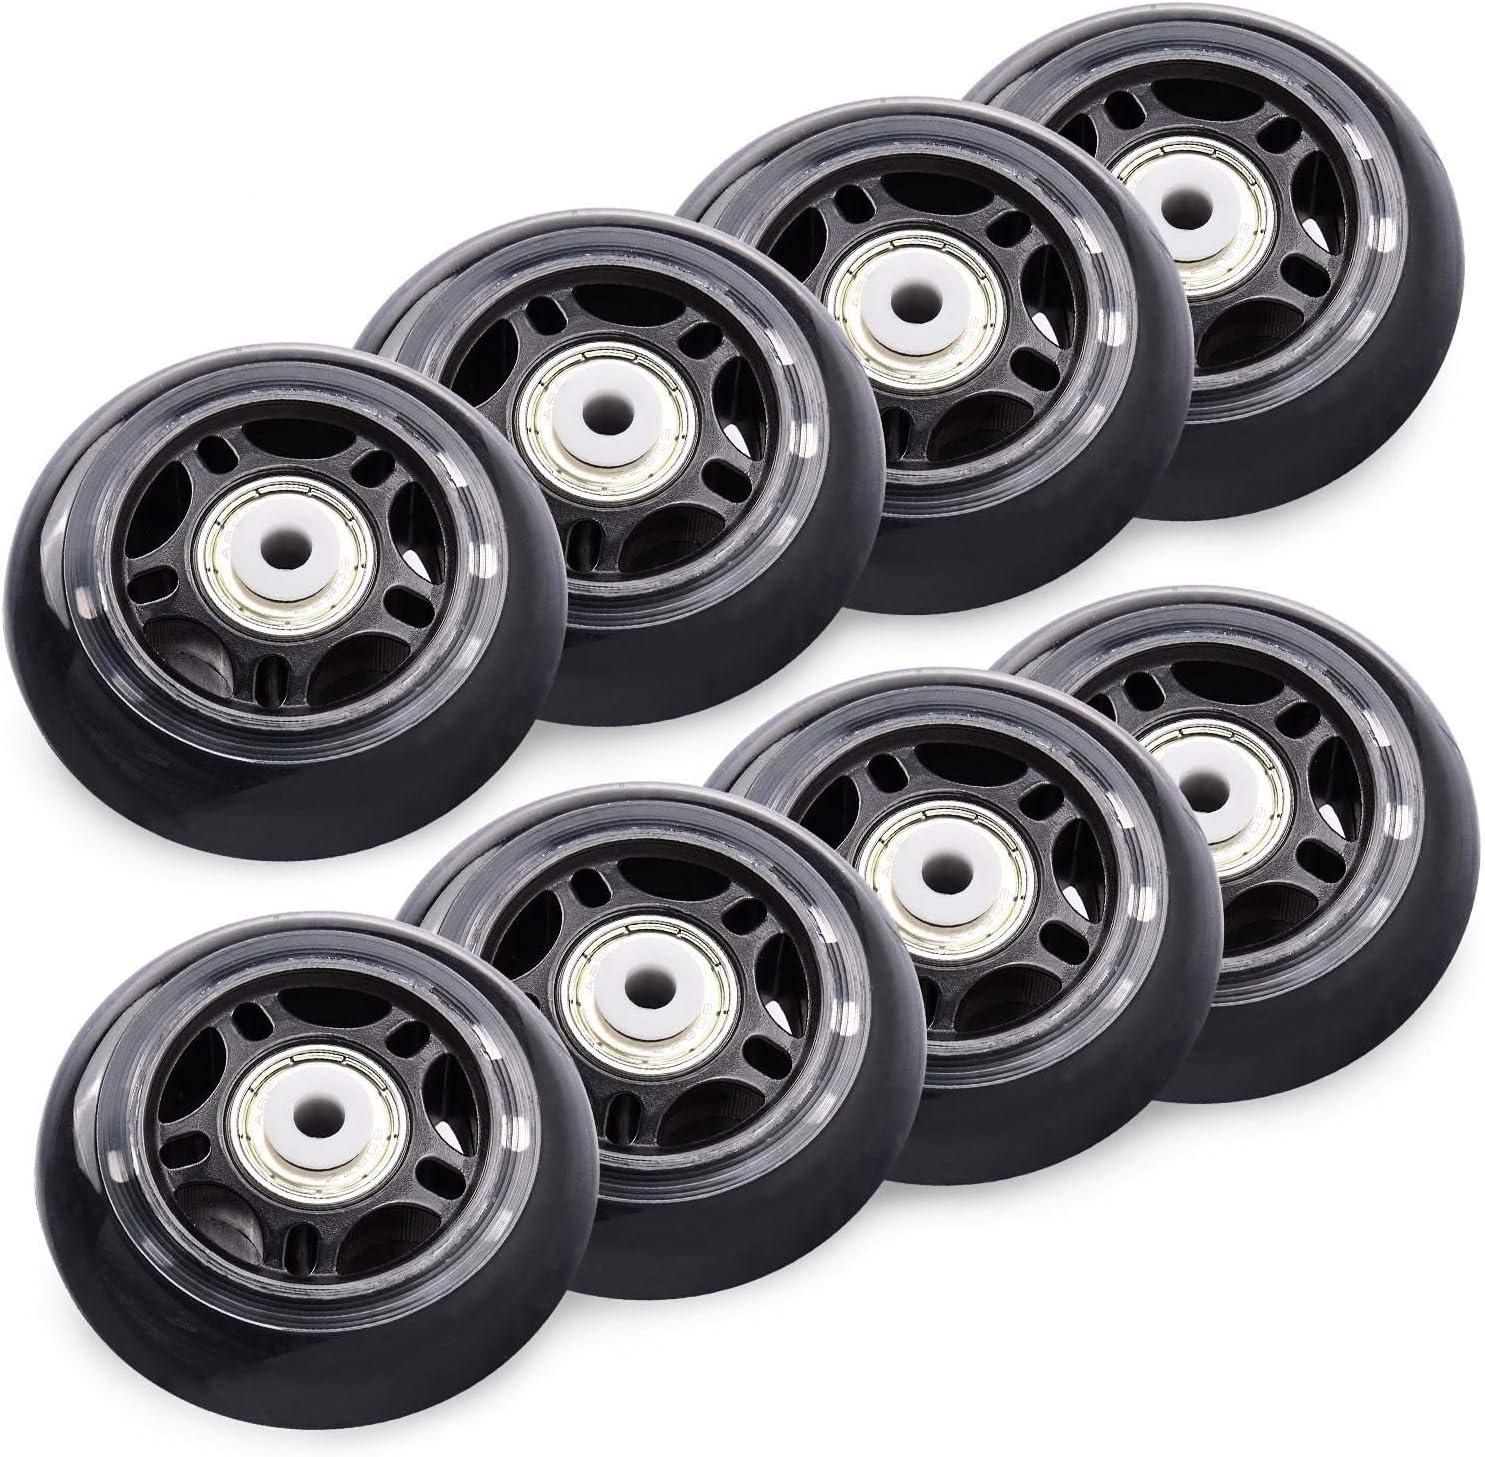 ruedas de repuesto para roller pack 8 76mm 84A ABEC-7